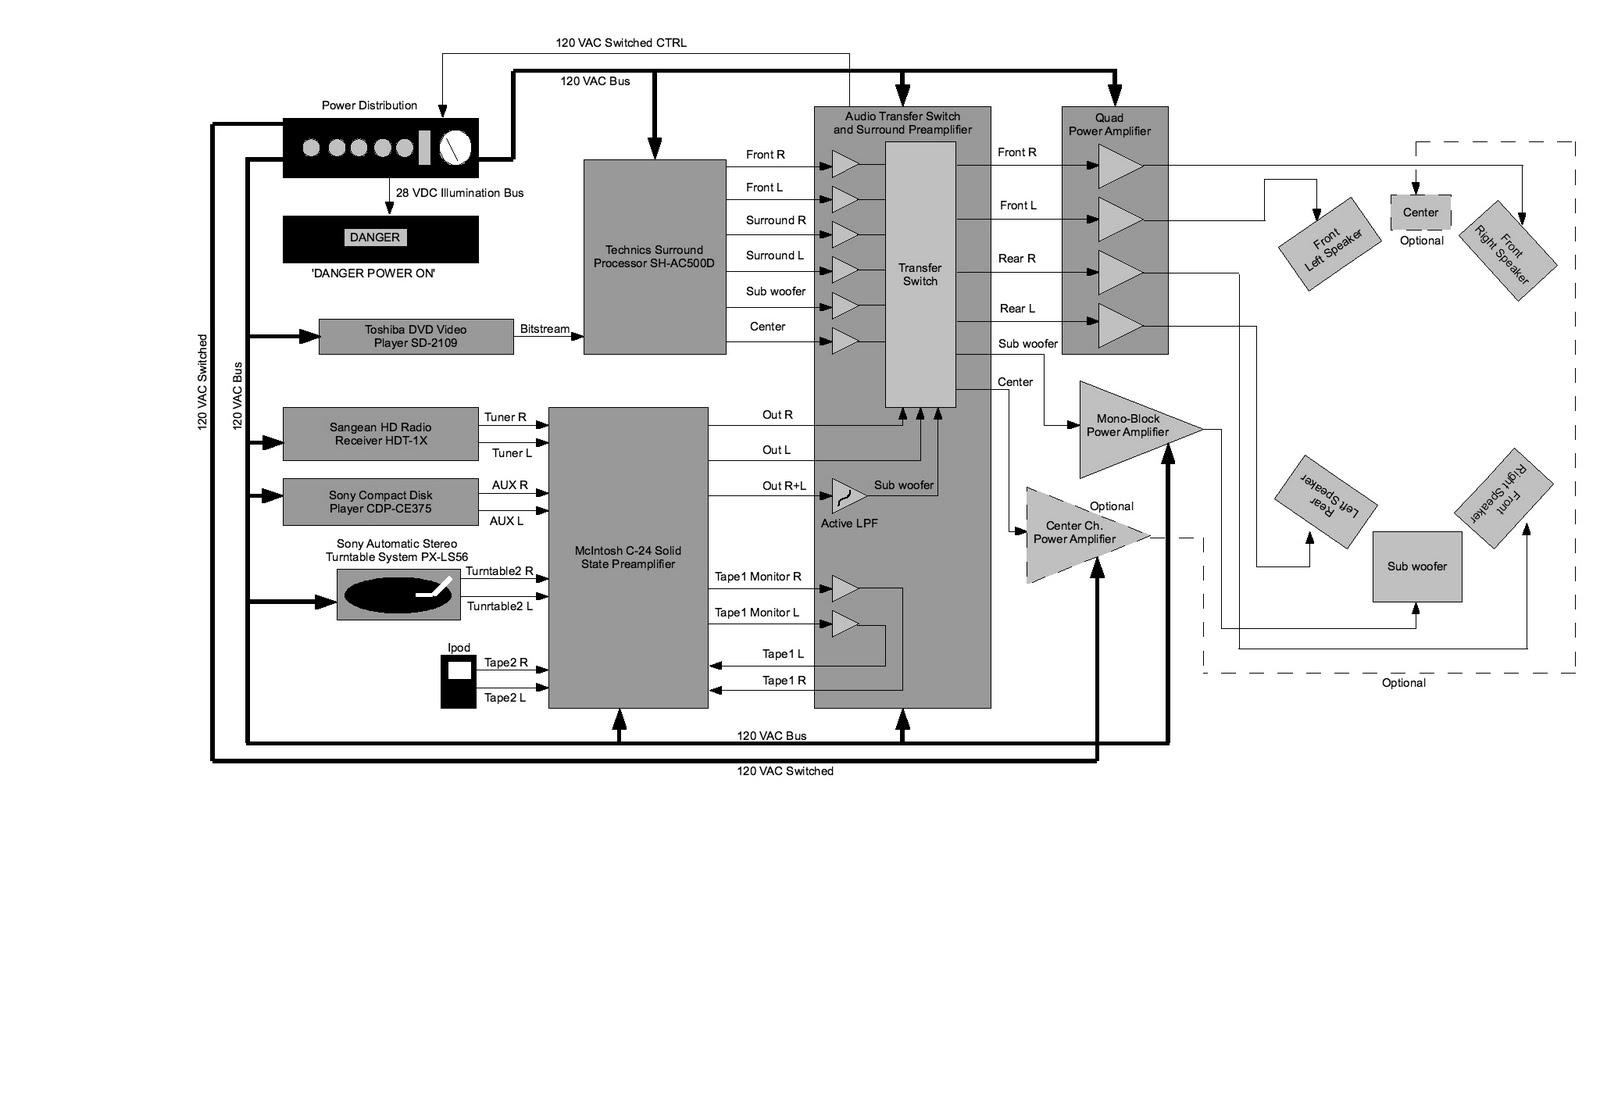 Pleasing Mr Vacuum Tube Block Diagram Of My Vacuum Tube Home Theater System Wiring Cloud Scatahouseofspiritnl